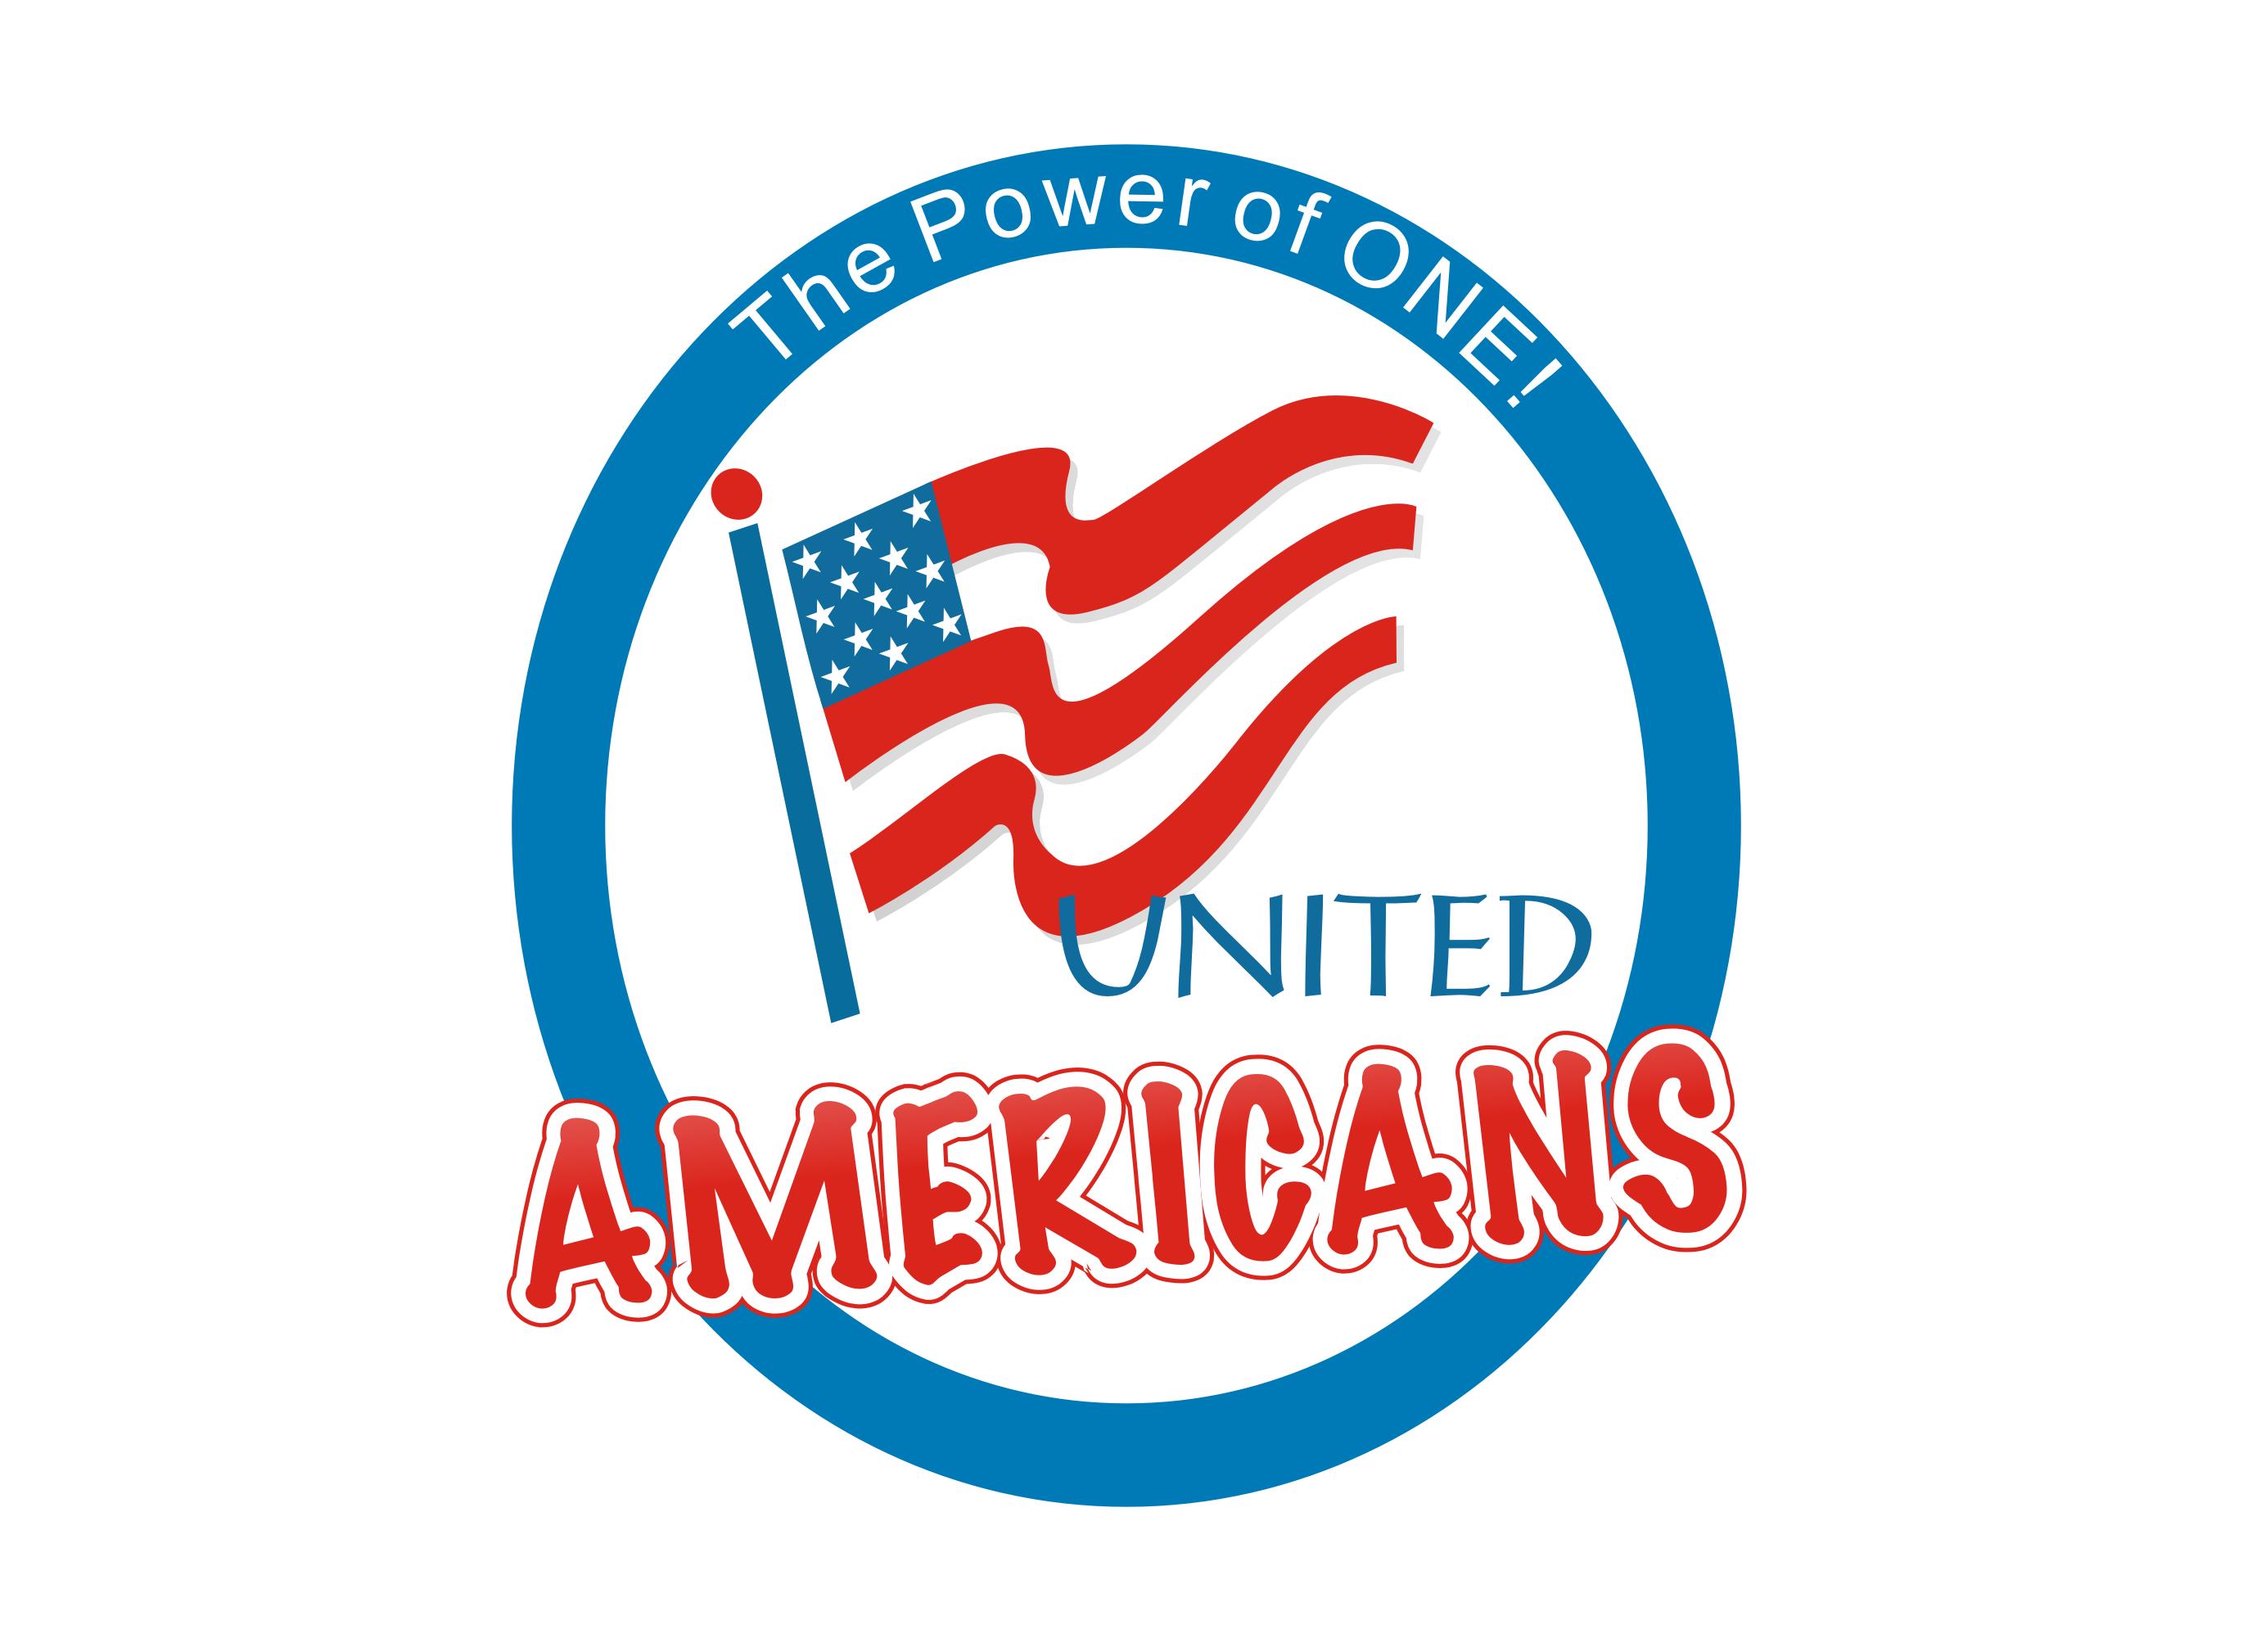 Logo Design by Shailender Kumar - Entry No. 29 in the Logo Design Contest Creative Logo Design for United Americans.